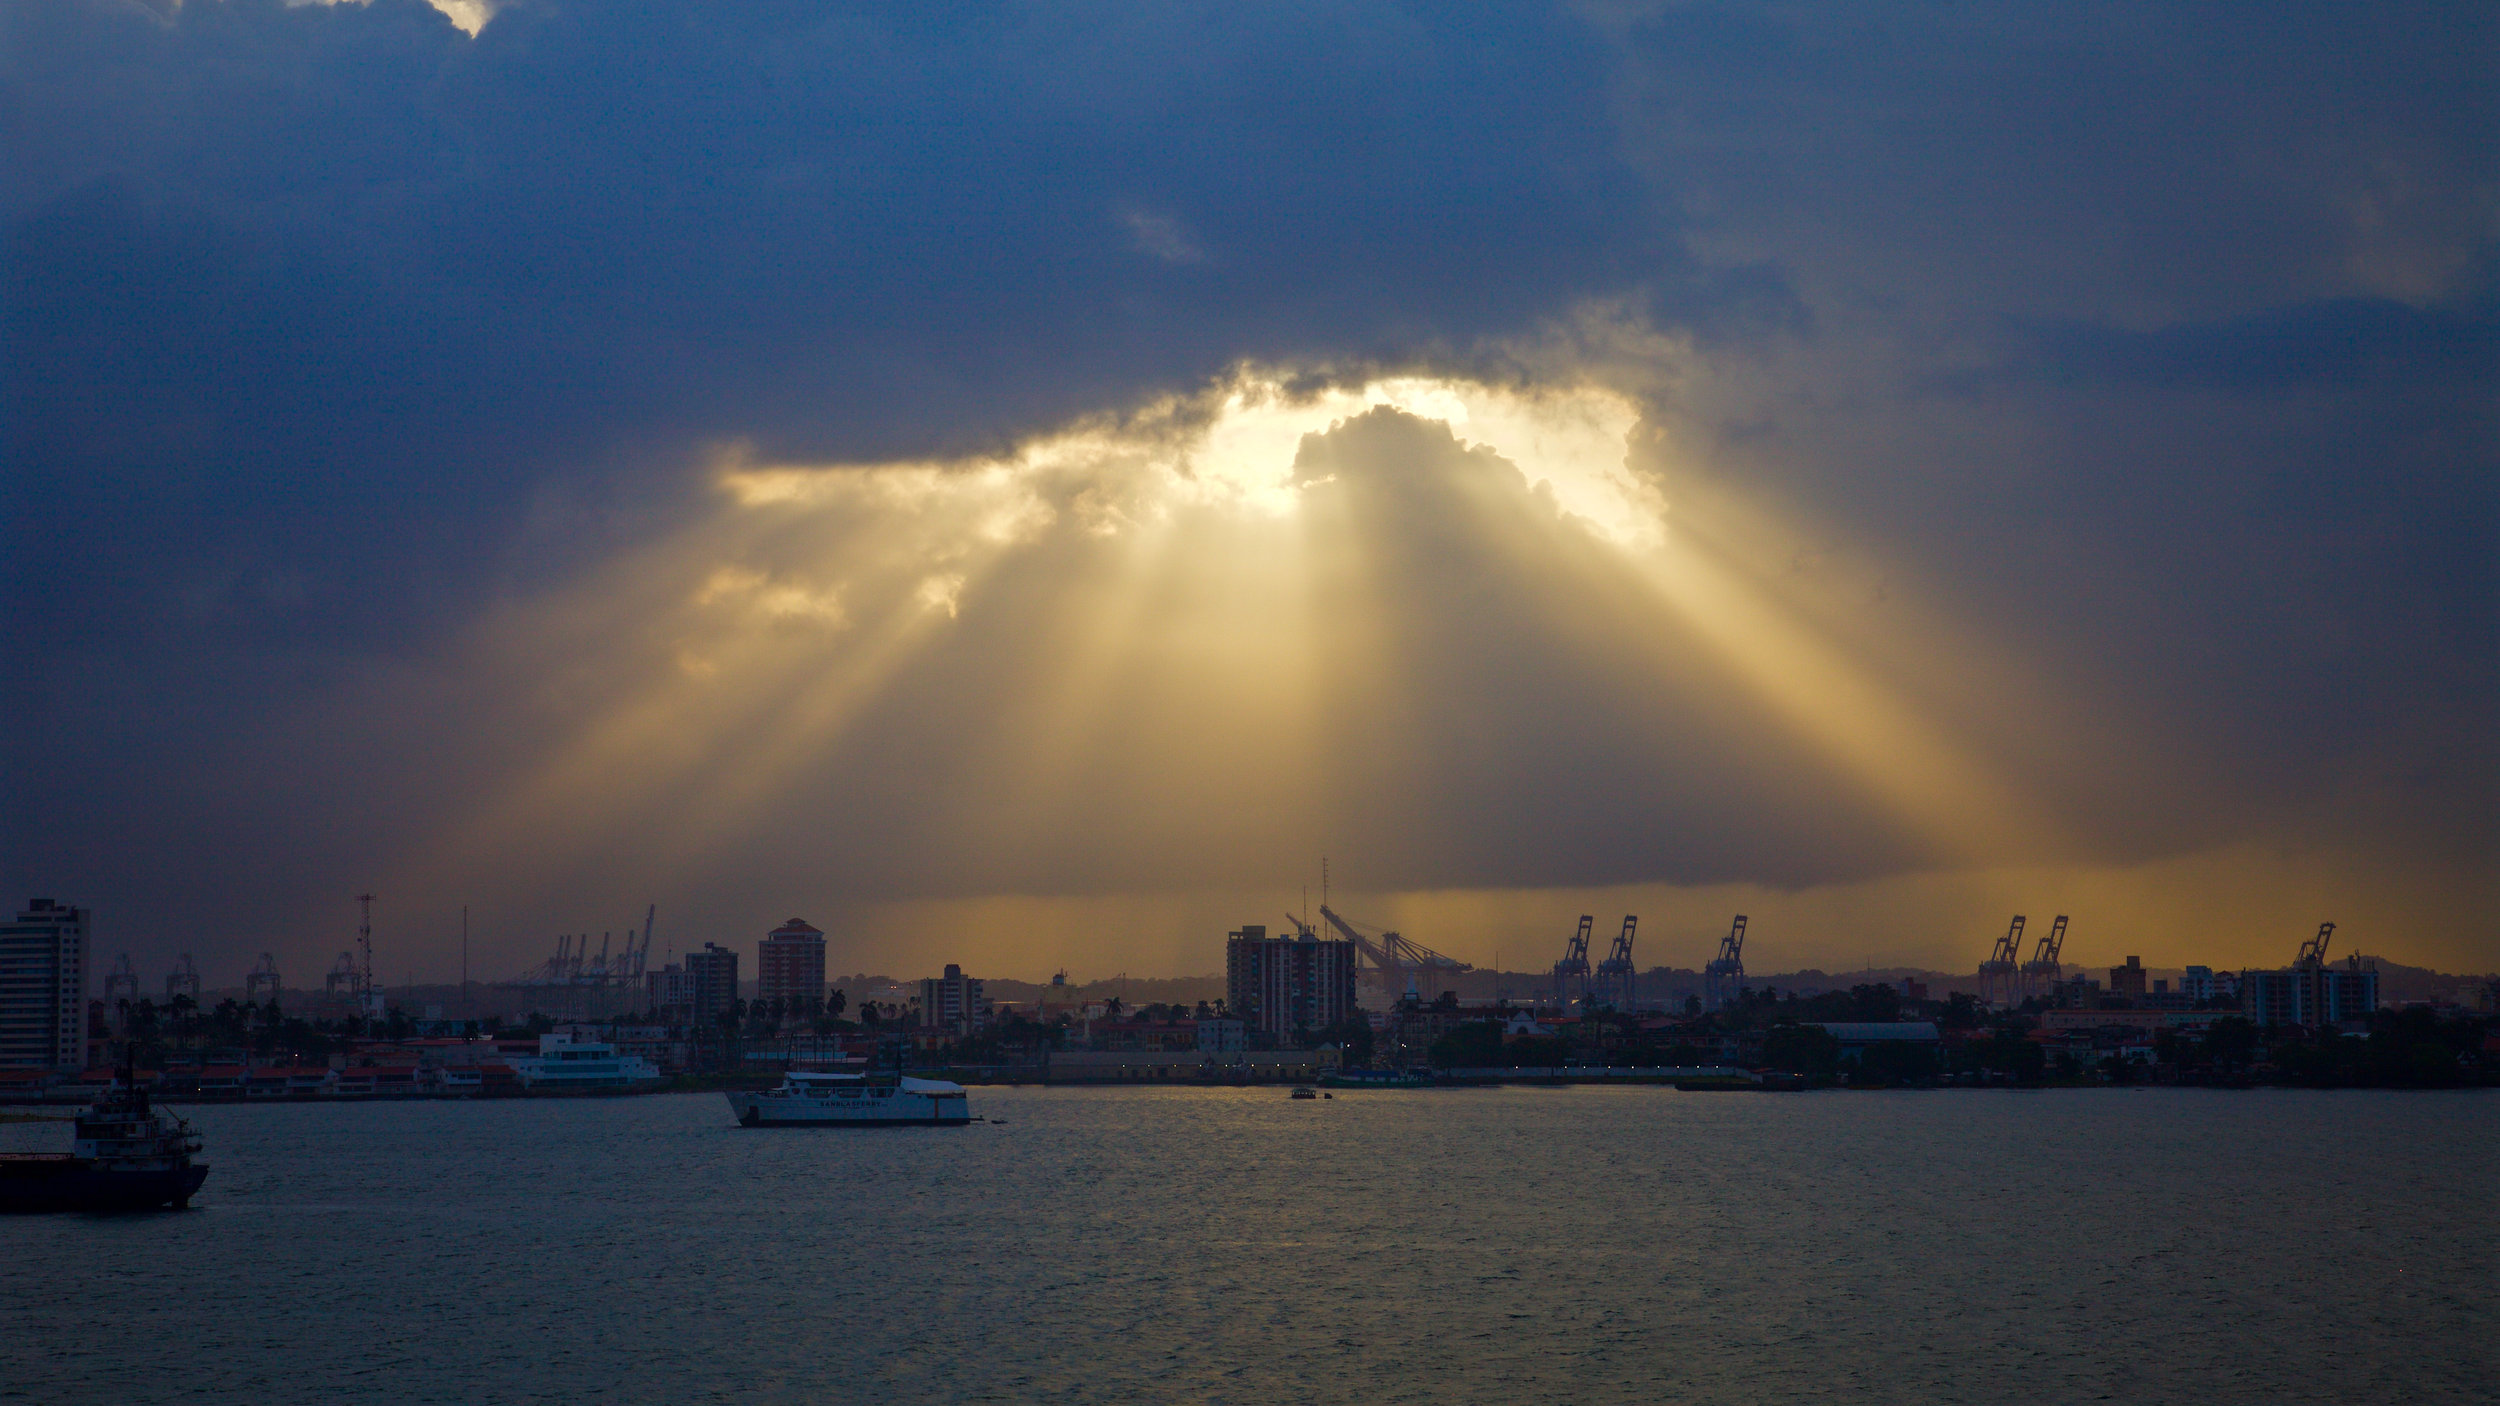 WC2015_Panama Canal_Morning_02-2.jpg